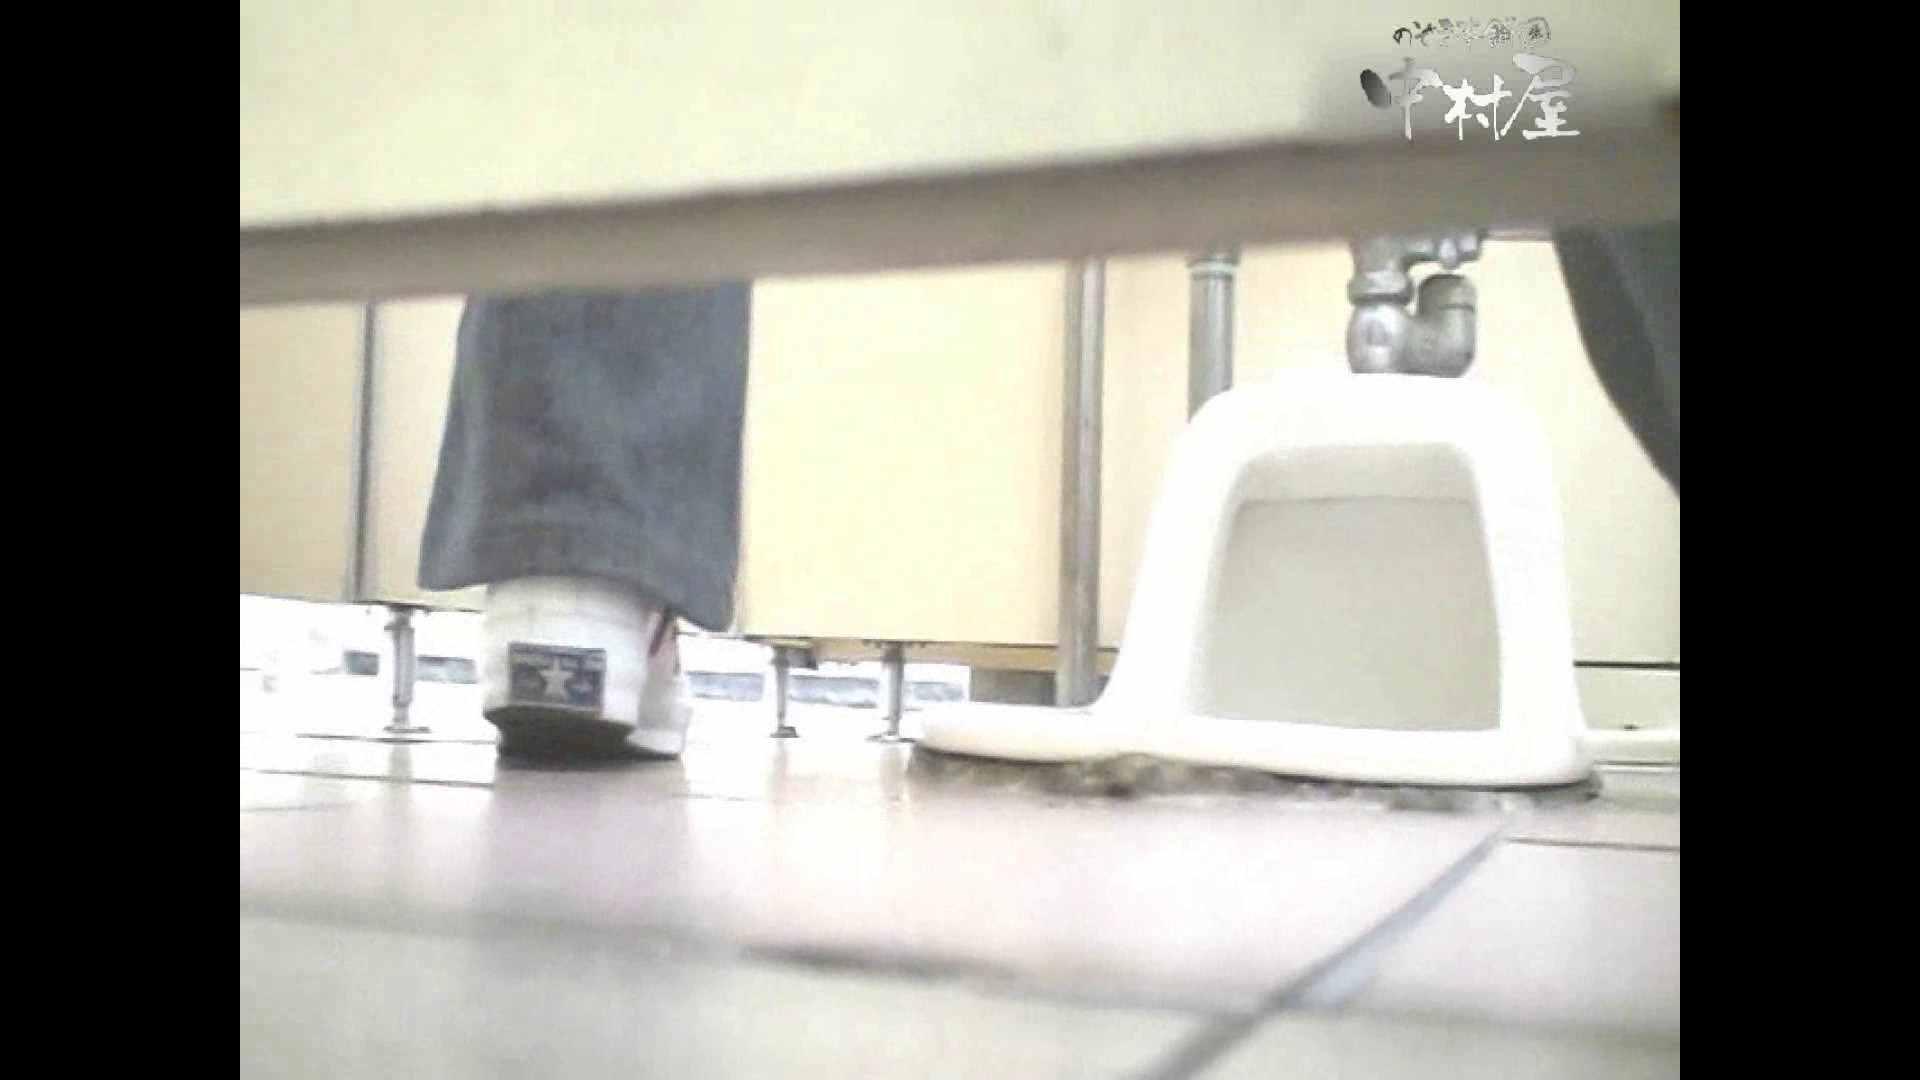 岩手県在住盗撮師盗撮記録vol.28 ハプニング | 盗撮師作品  79pic 43